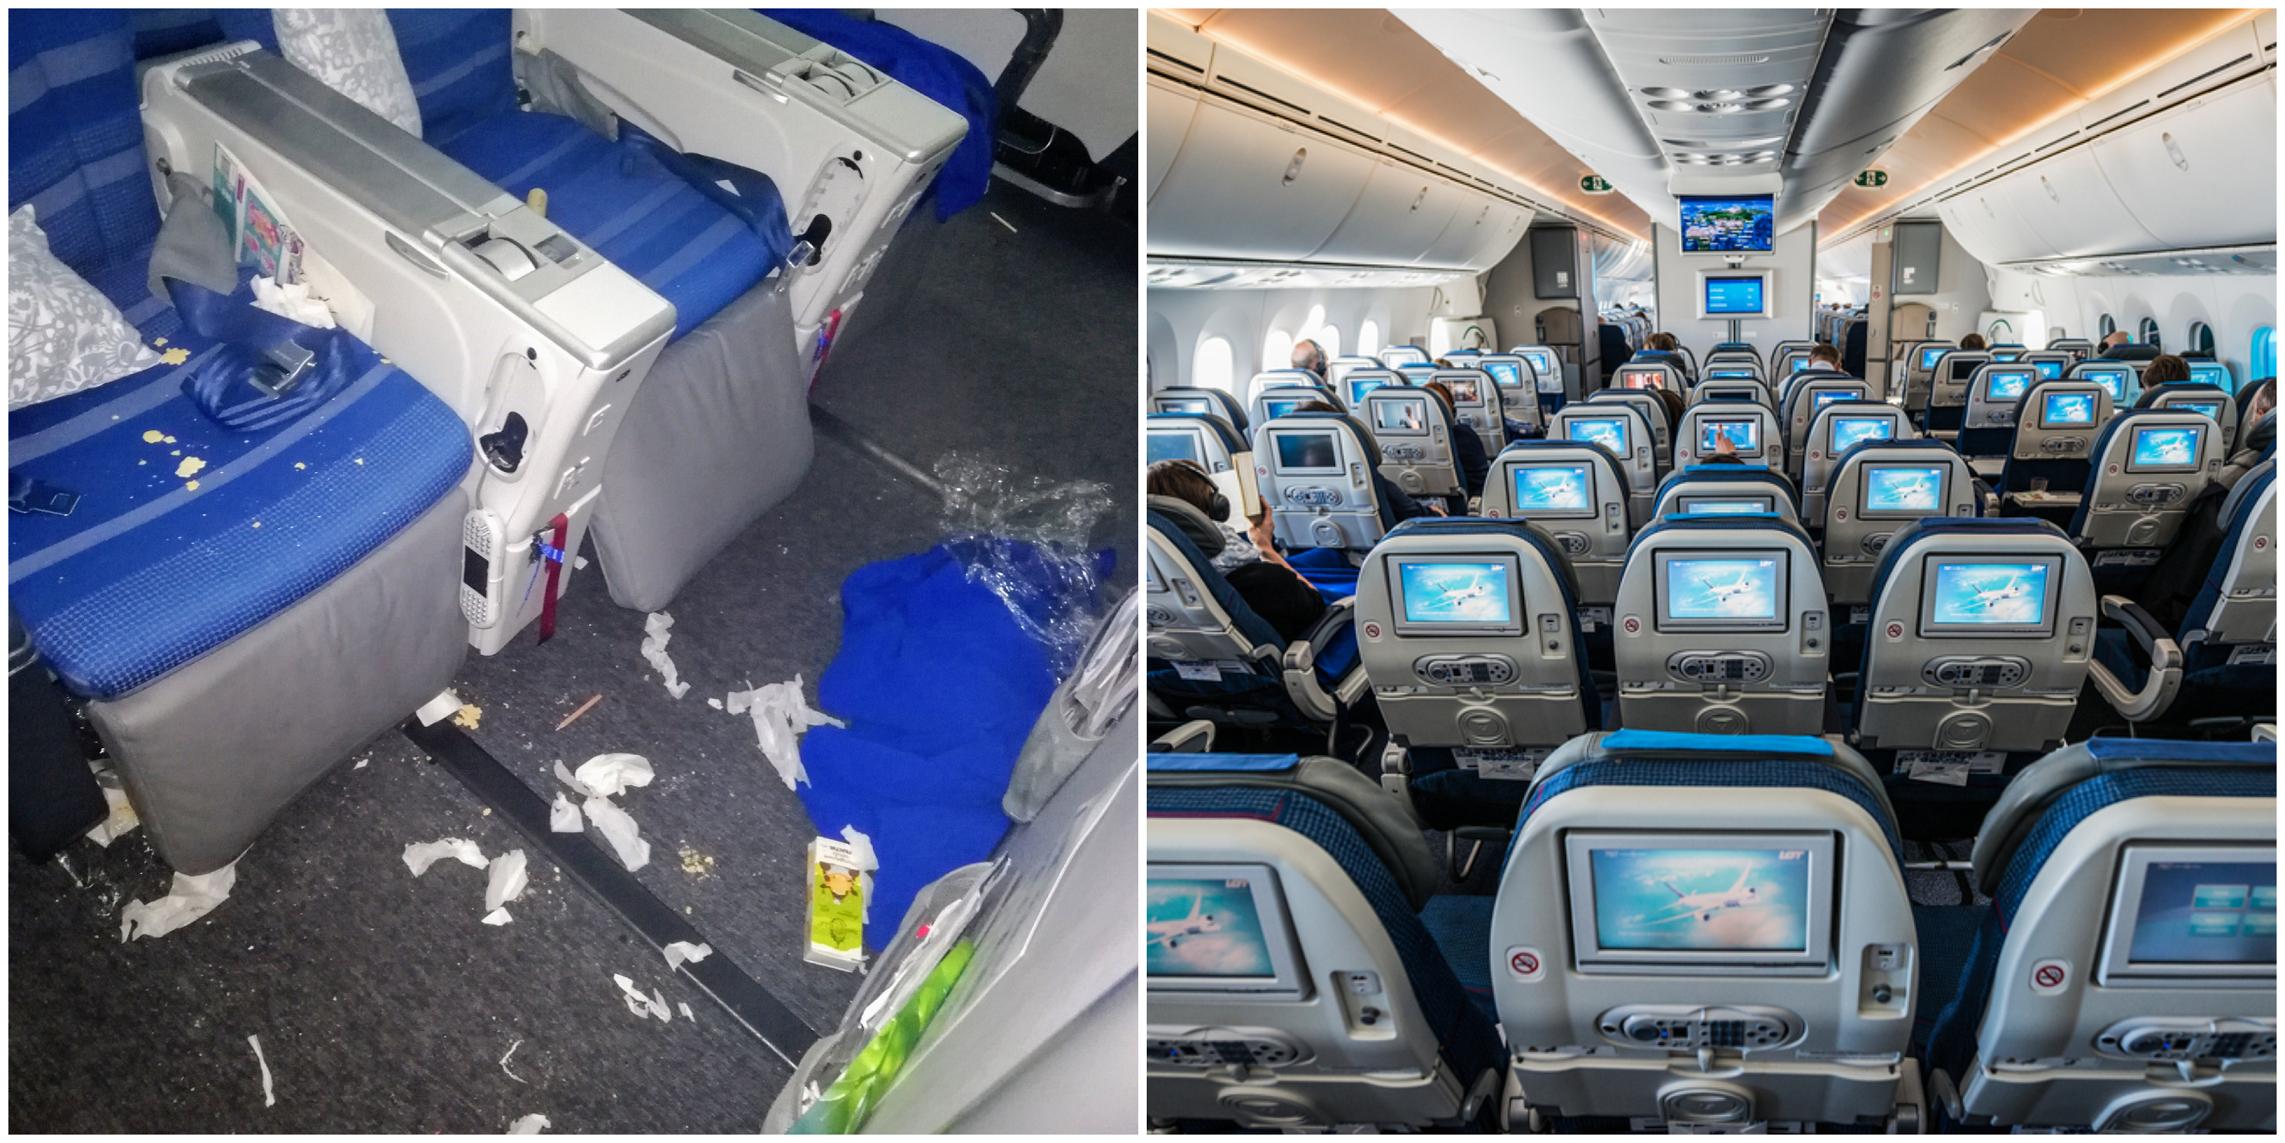 bałagan w samolocie